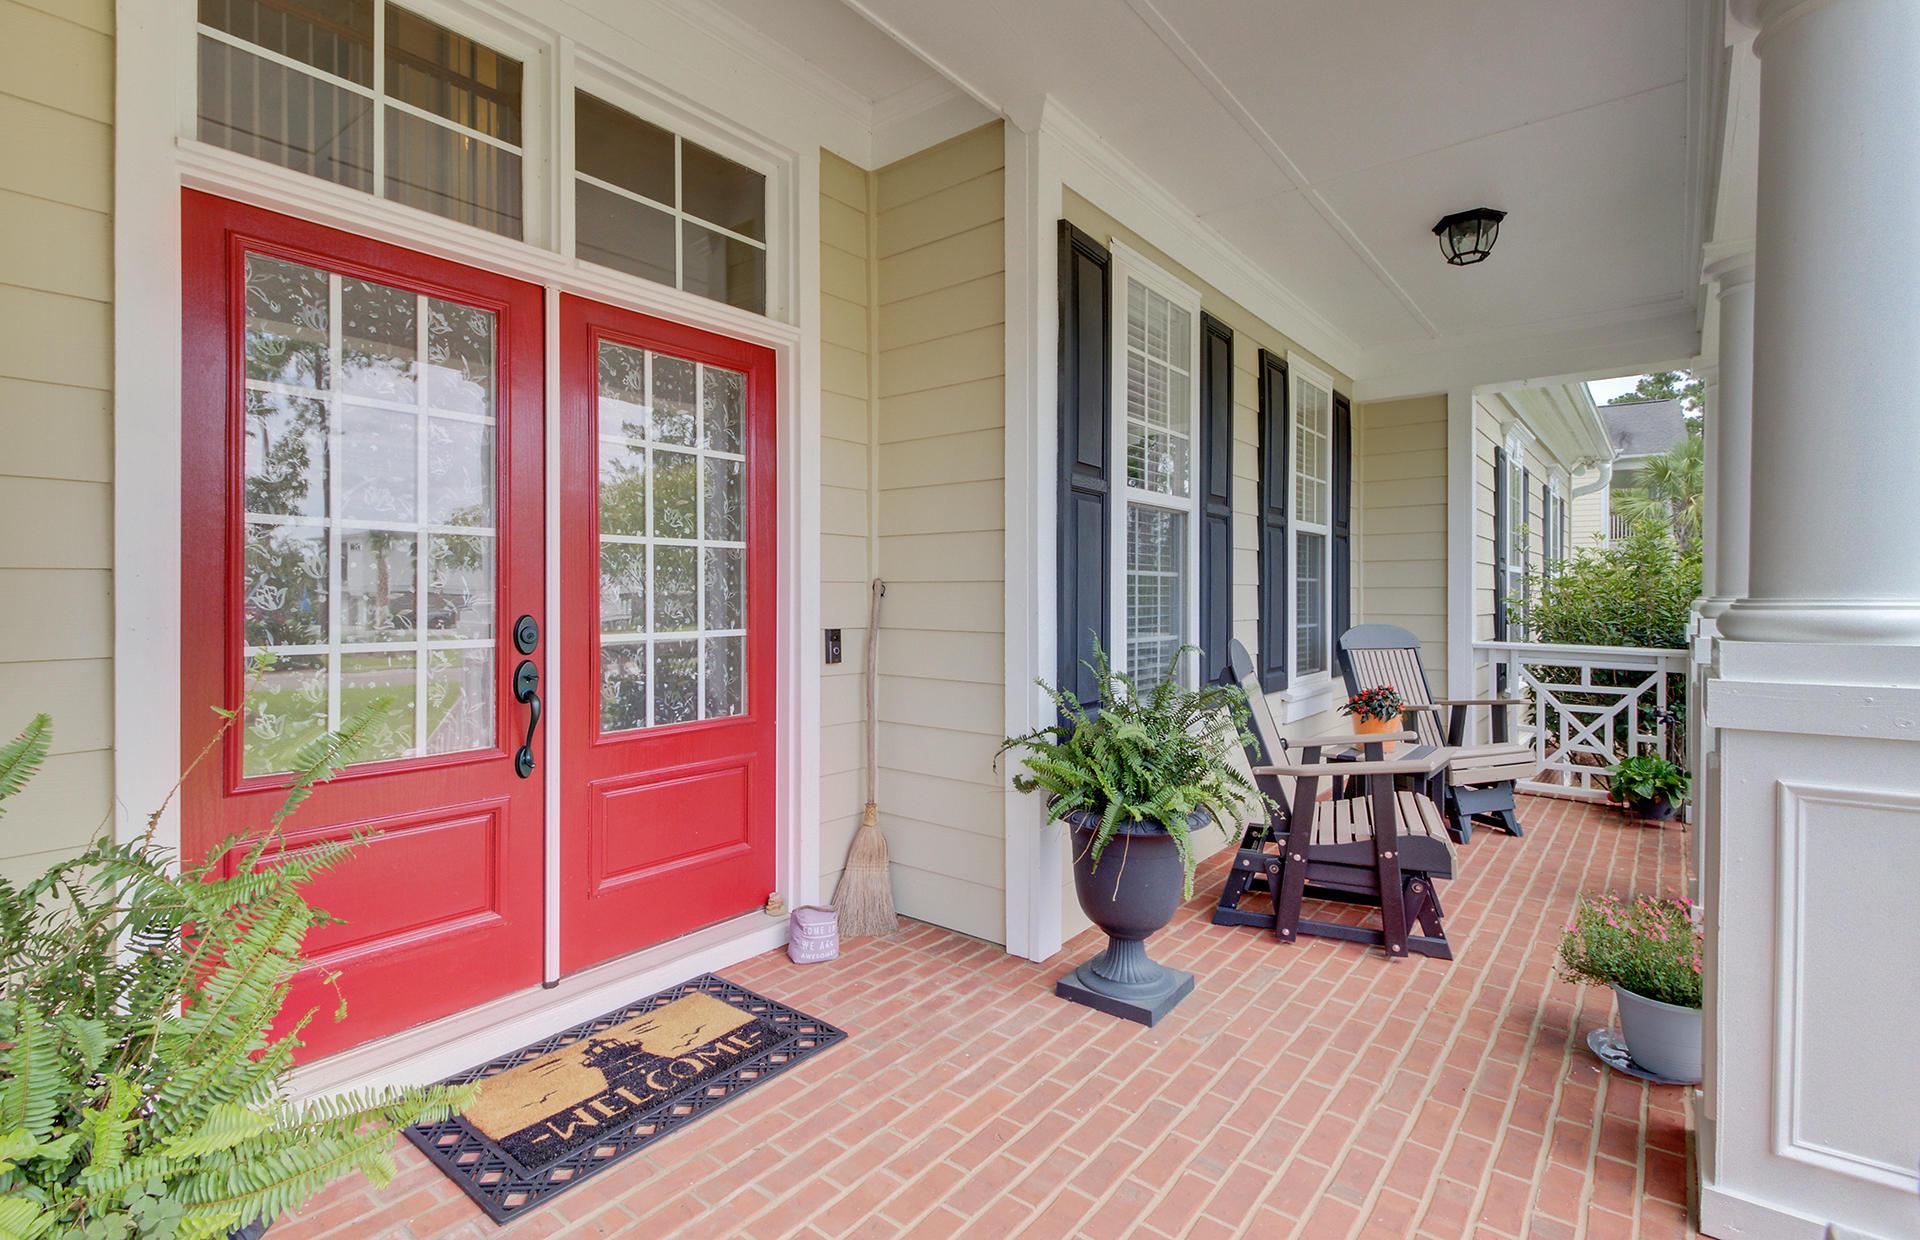 Dunes West Homes For Sale - 2453 Darts Cove, Mount Pleasant, SC - 41